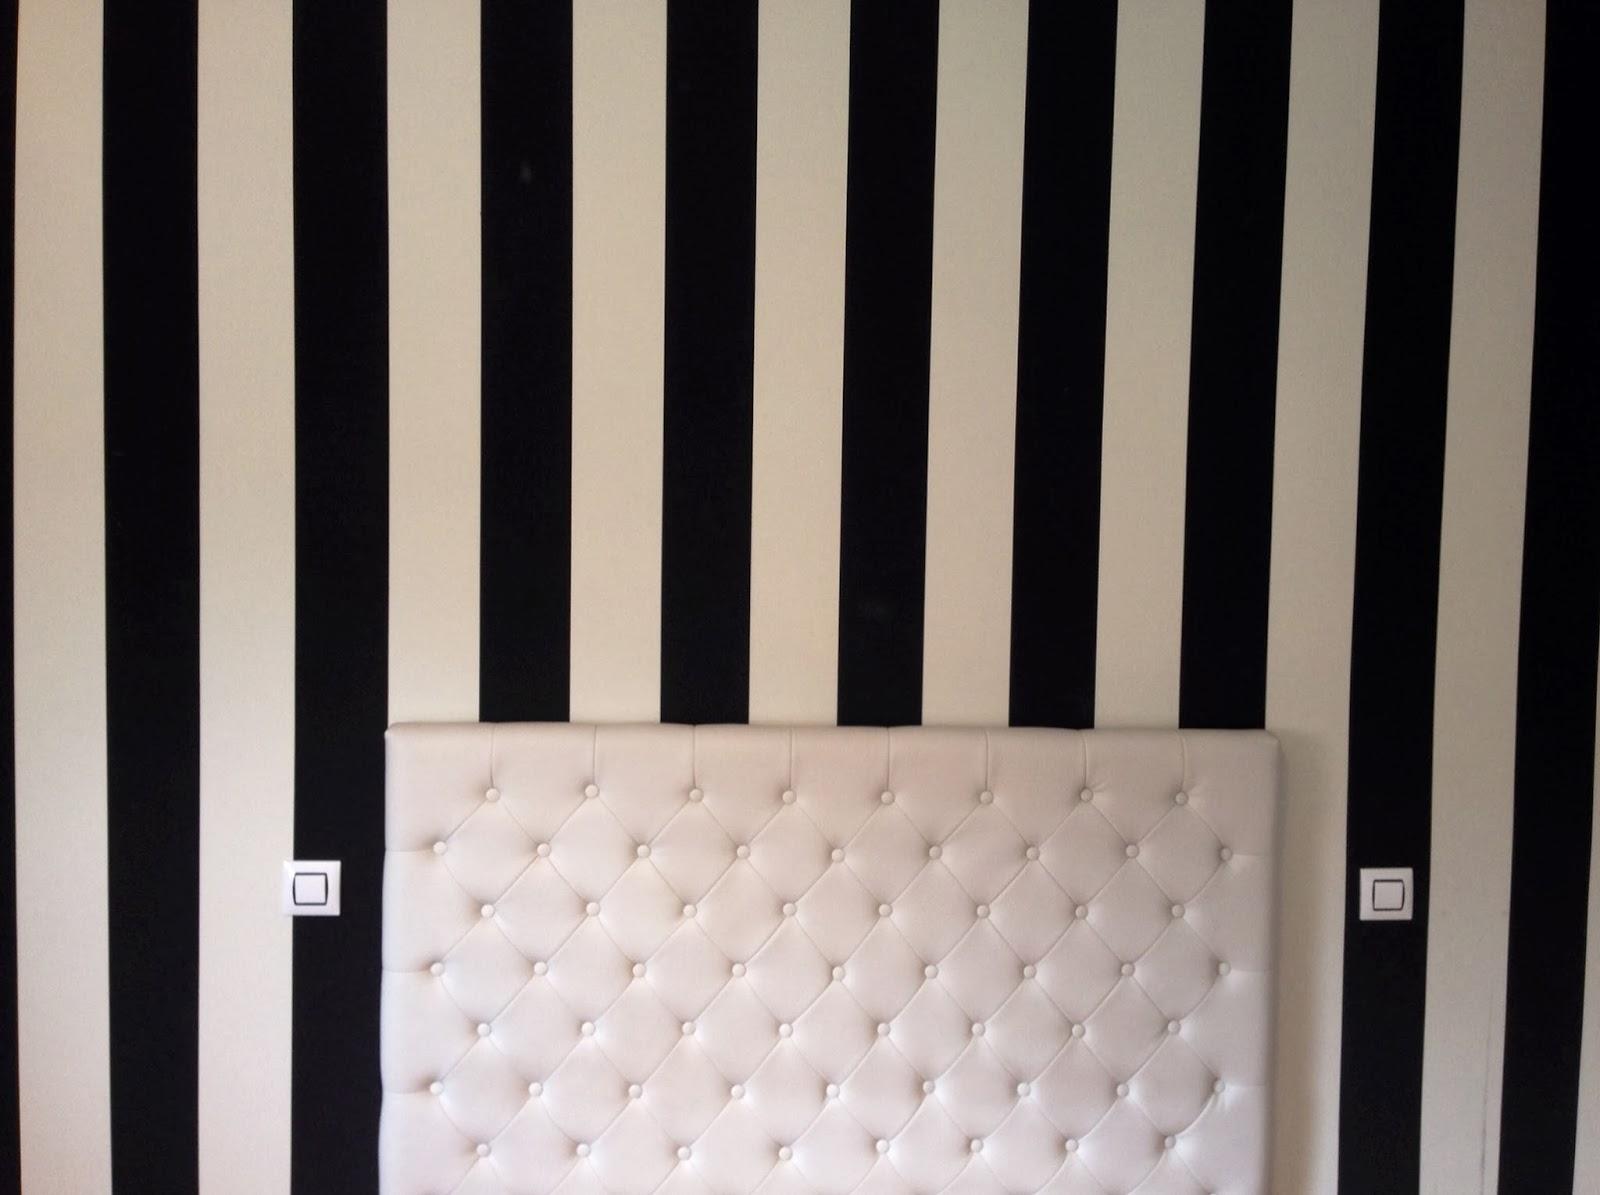 Pinturas veriax s l paredes a rayas - Paredes a rayas verticales ...